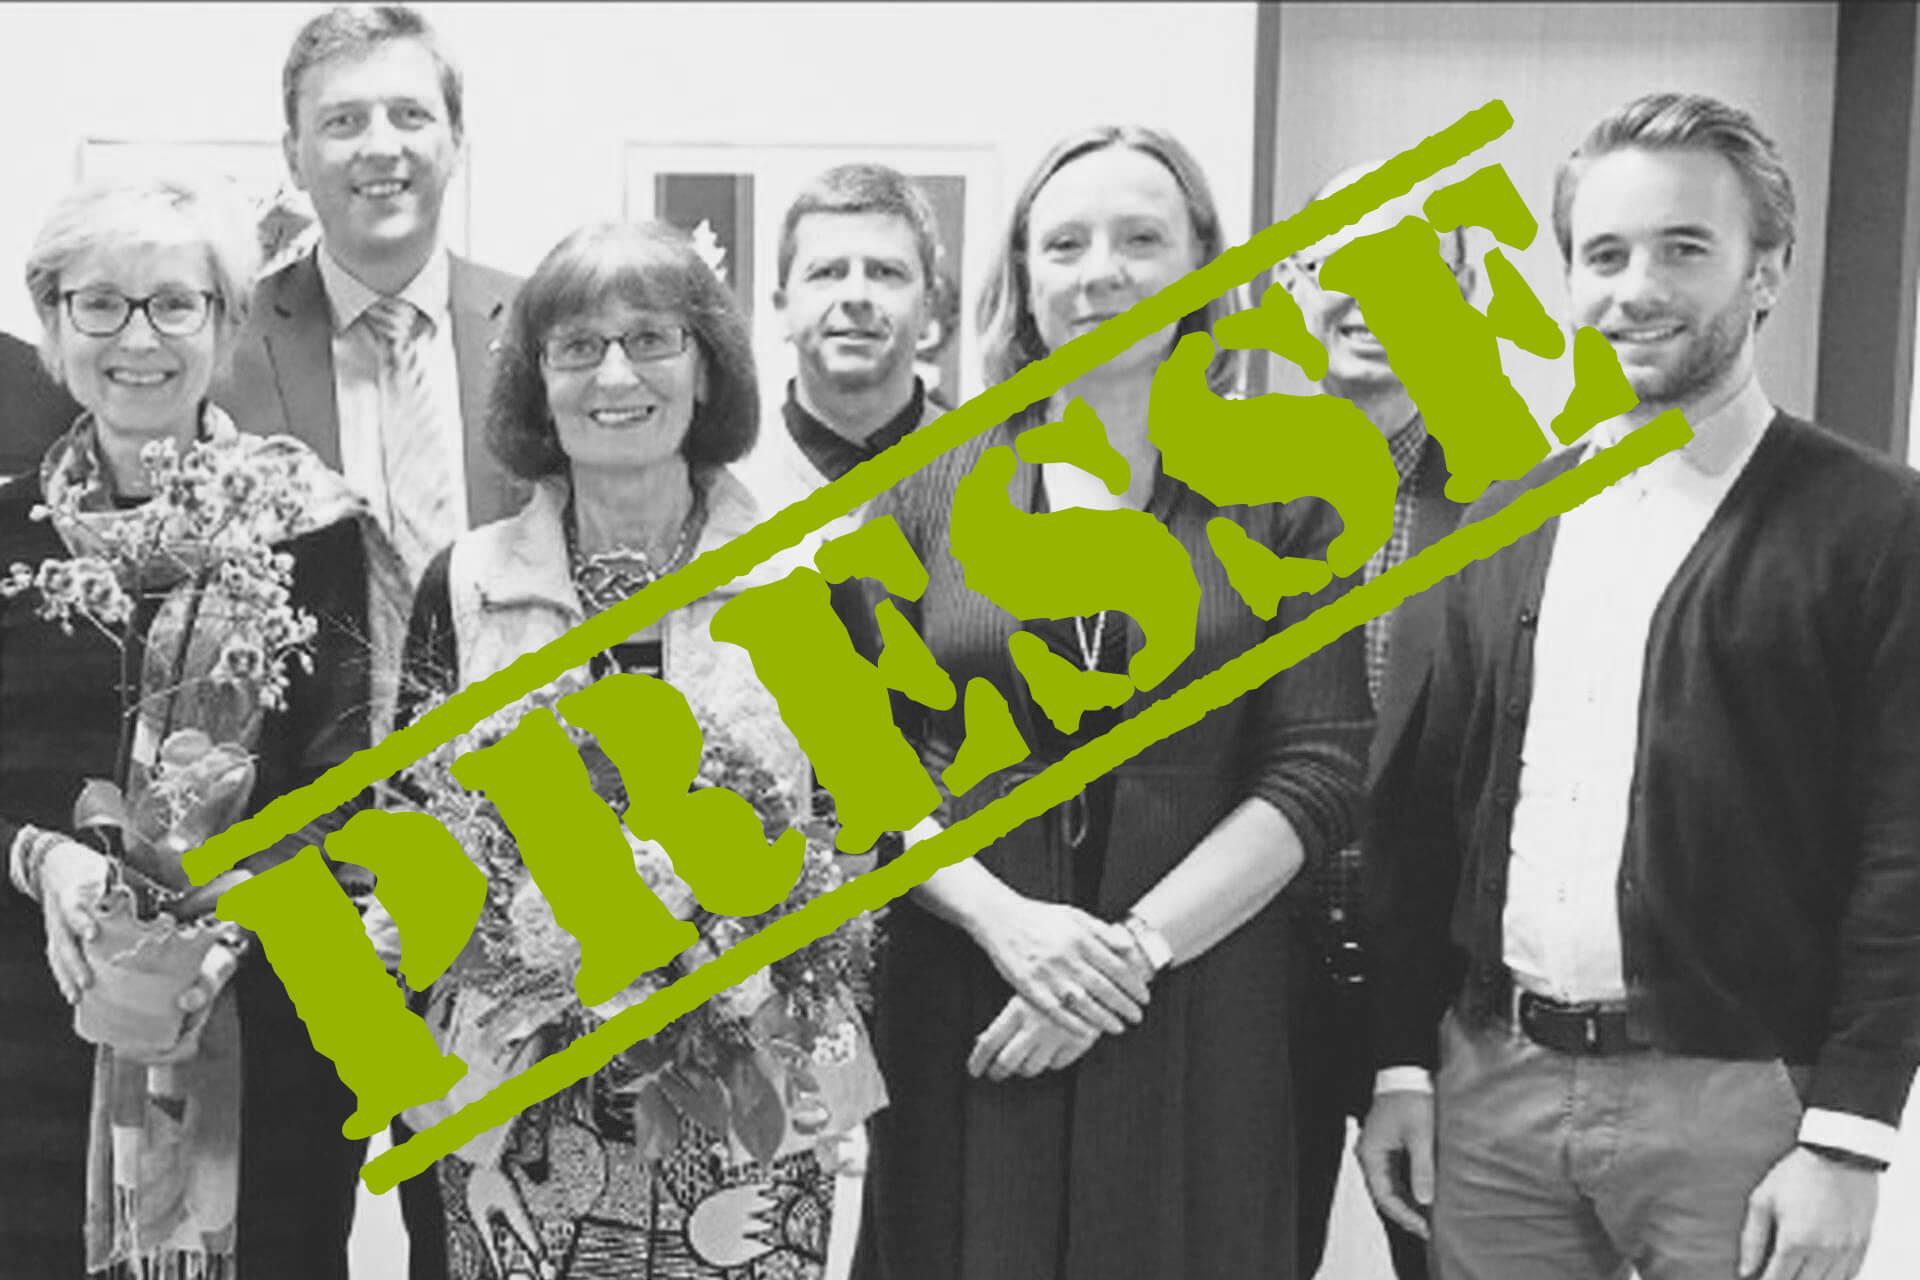 2016 10 28 Presse Foererverein Clip Content 1